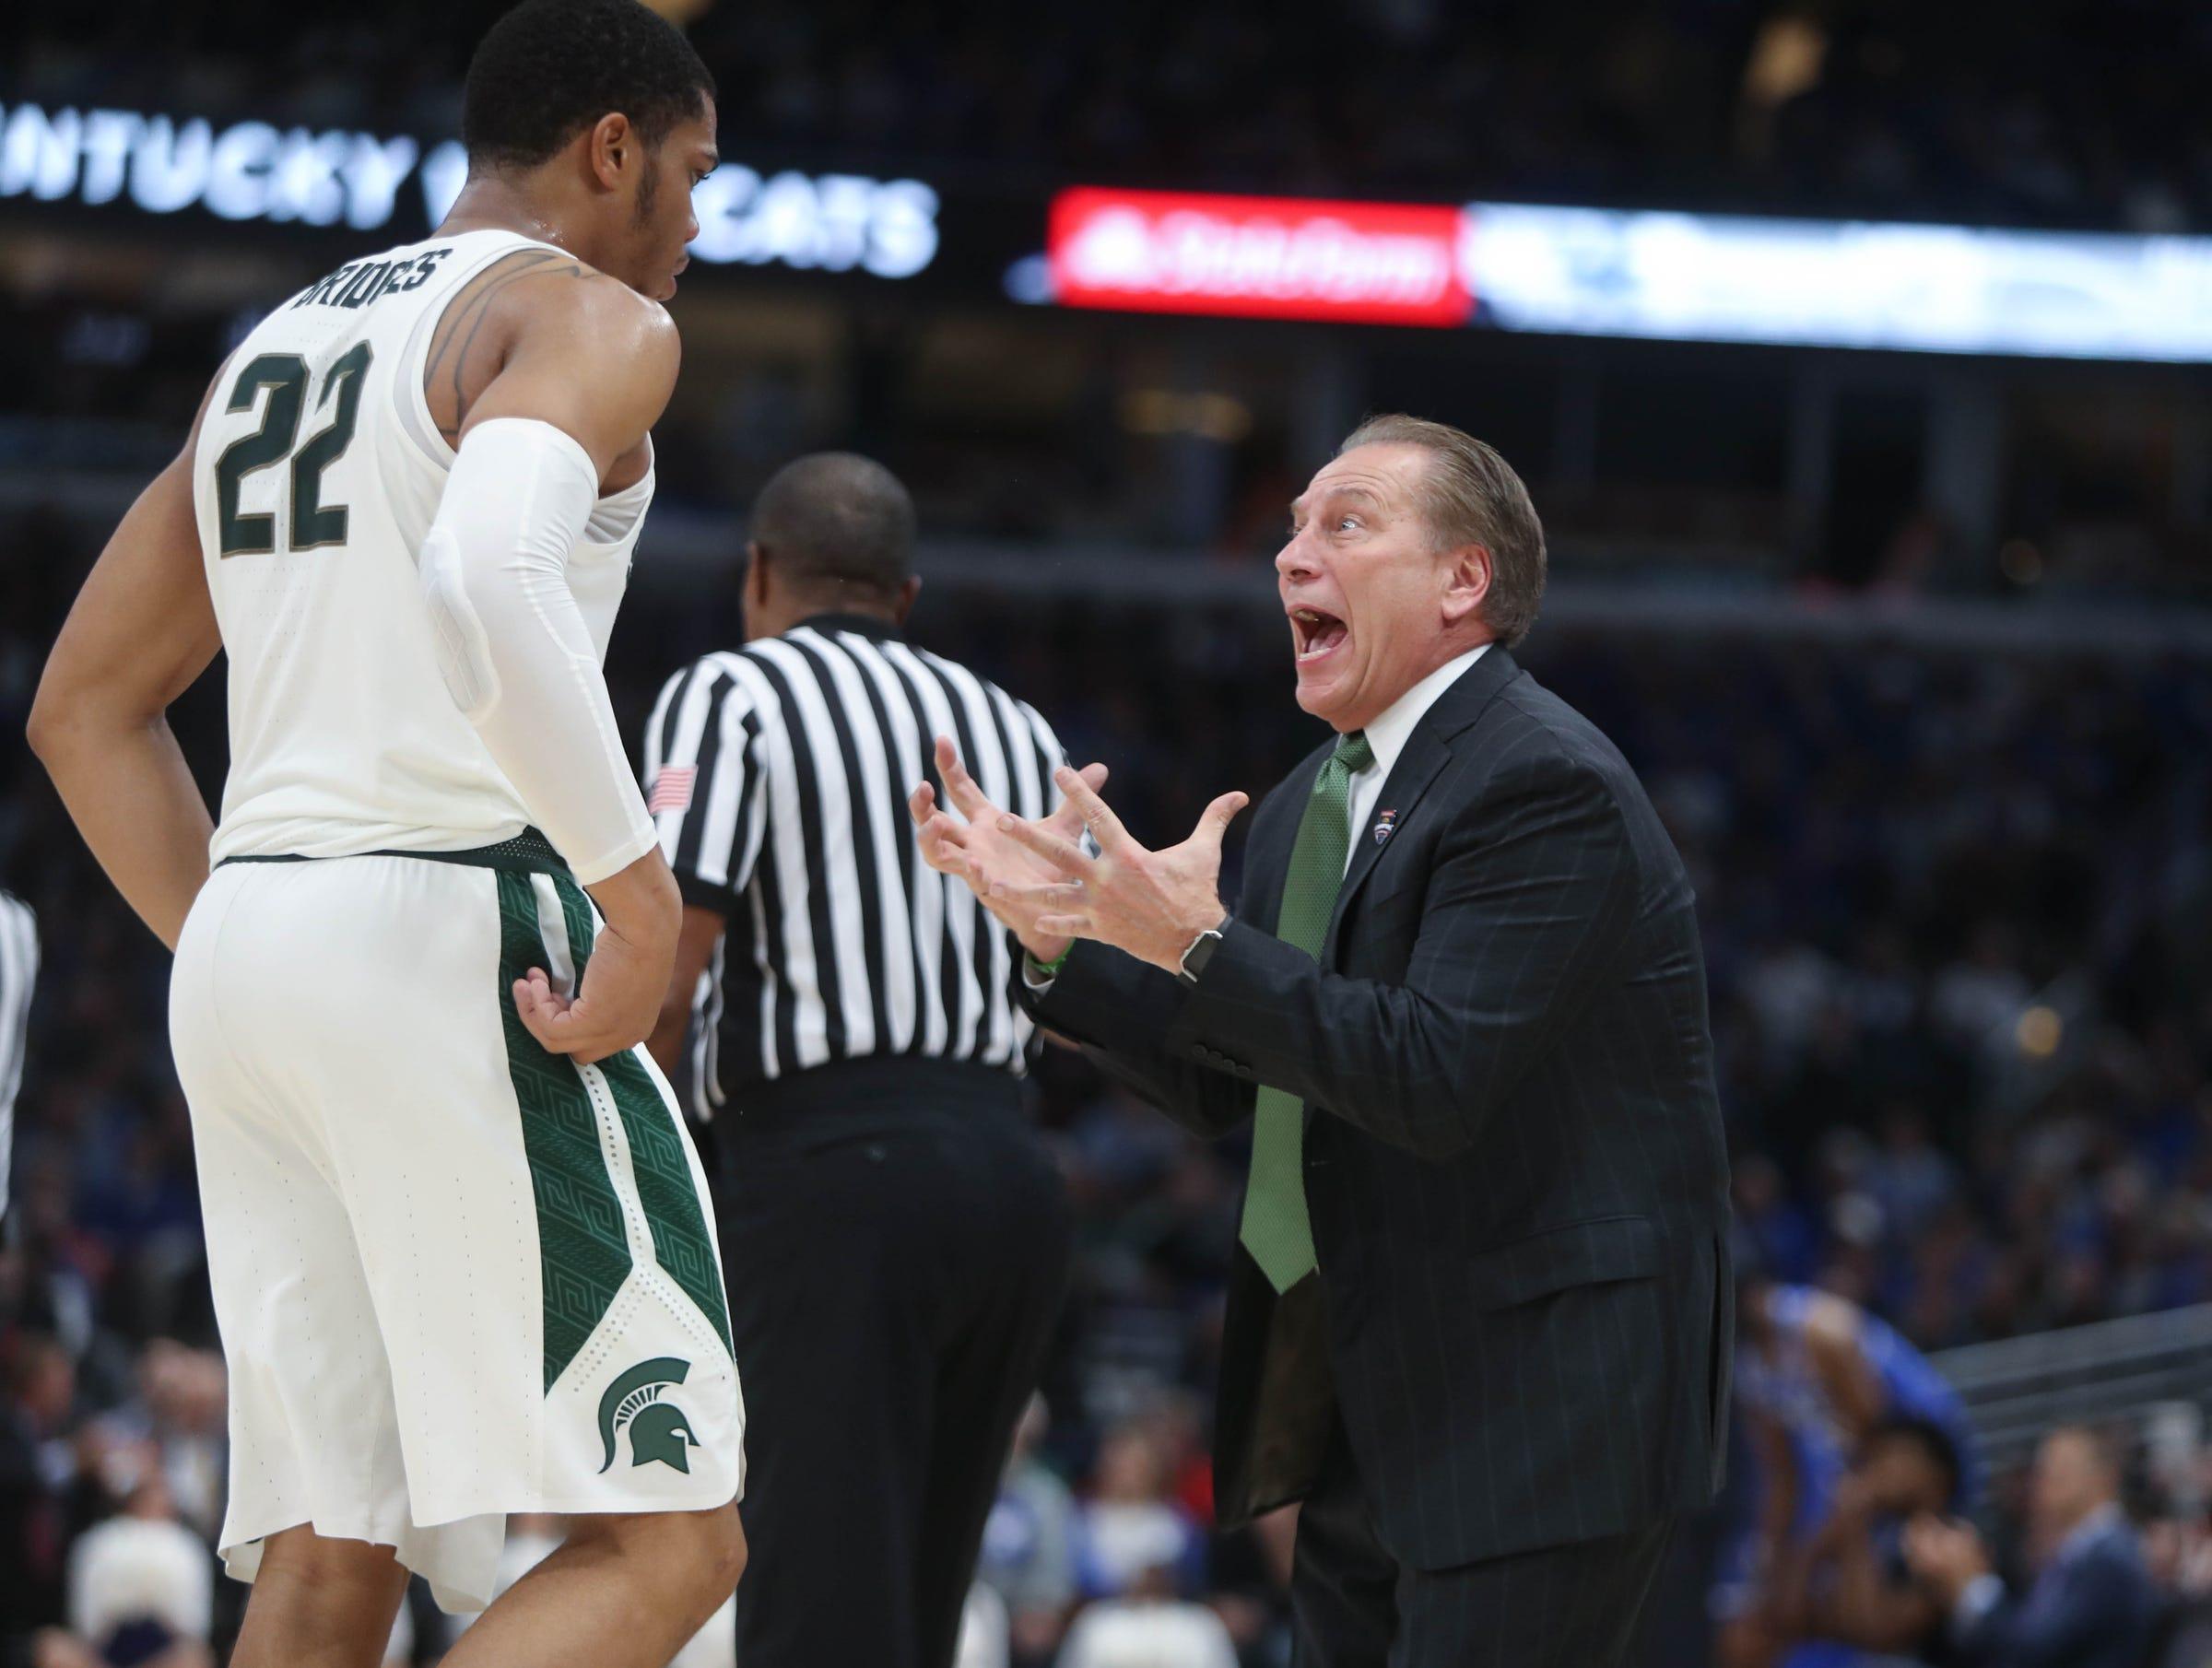 Michigan State coach Tom Izzo talks with Miles Bridges